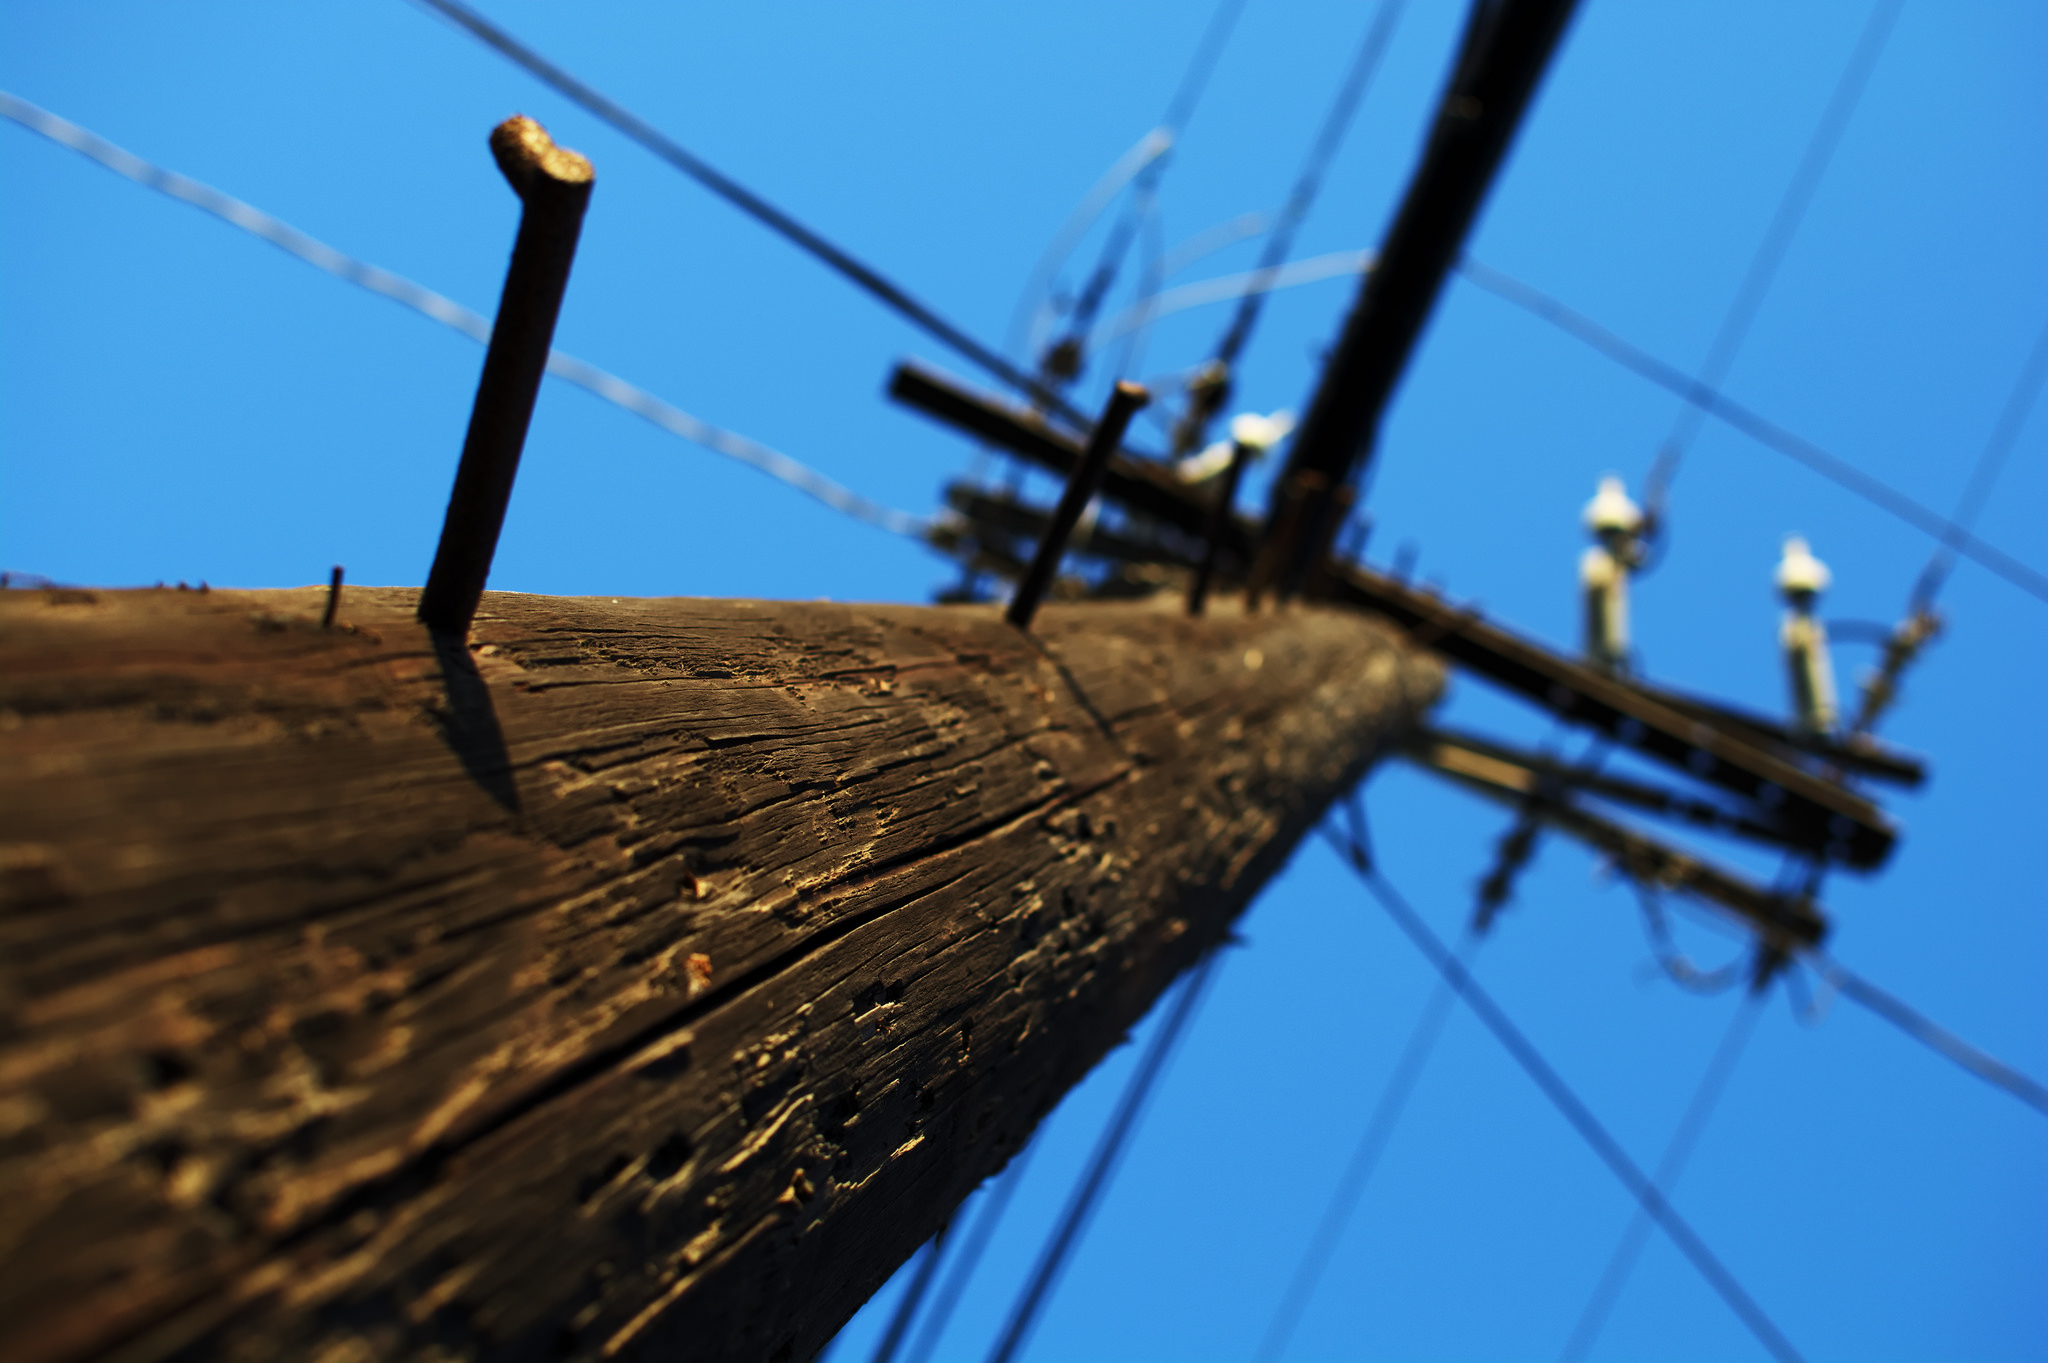 Utility/Electrical pole. (Credit: Maëlick/Flickr)